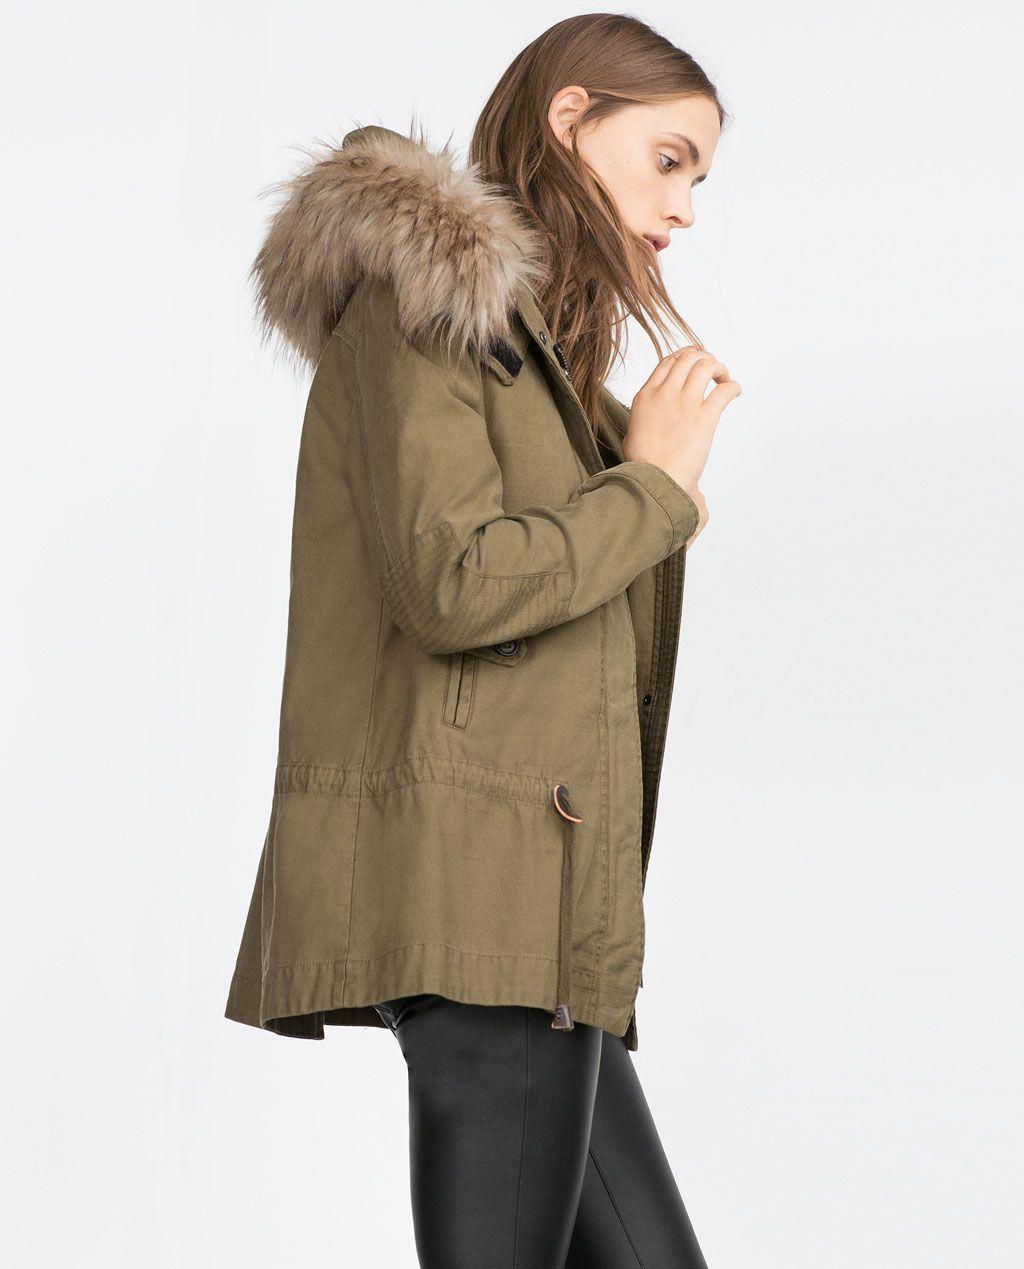 parka with fleece lining from zara parka femme hiver manteau femme zara